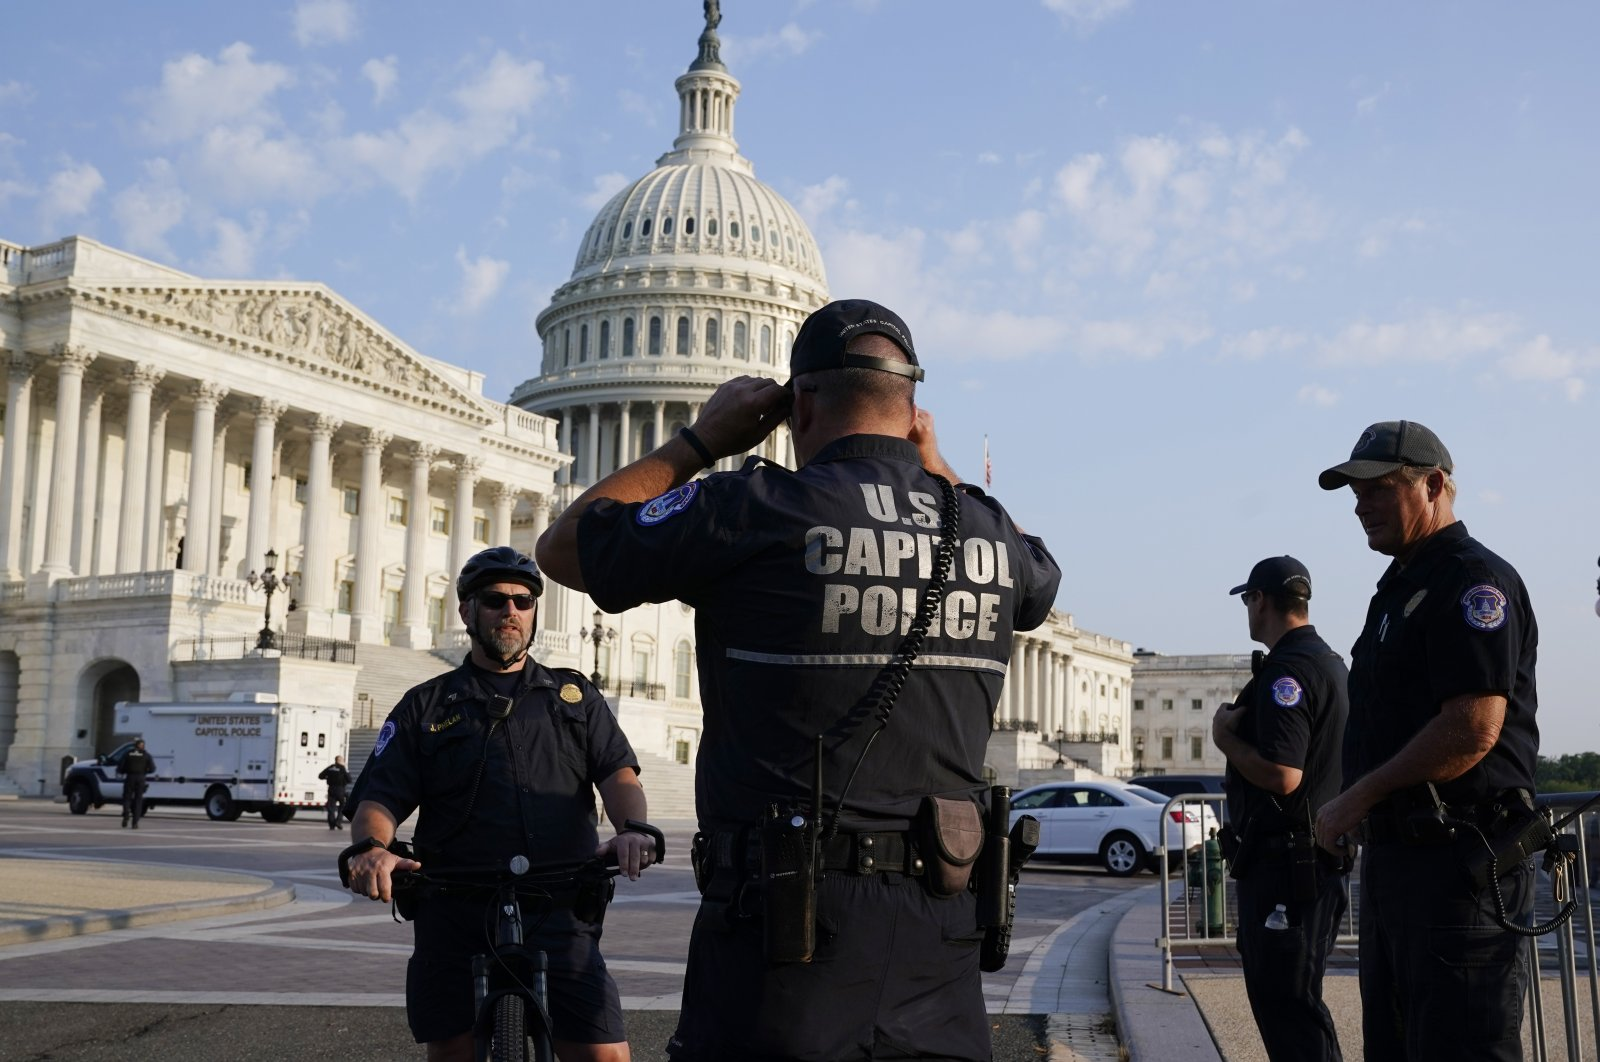 The U.S. Capitol is seen in Washington, early Tuesday as U.S. Capitol Police watch the perimeter, Washington, U.S., July 27, 2021. (AP Photo)